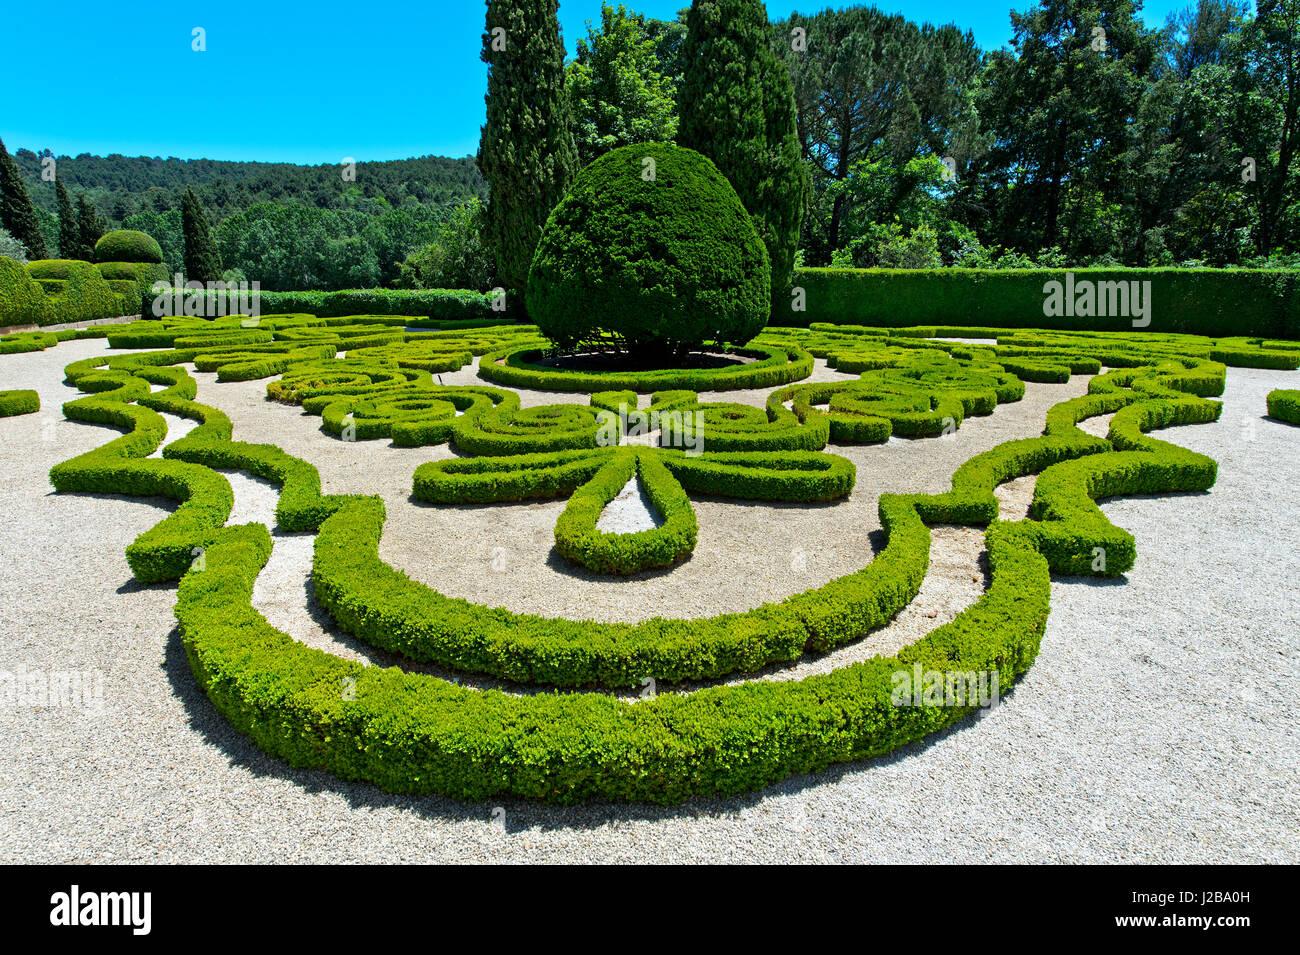 Baroque Garden, Mateus Palace, Palacio de Mateus, Mateus, Vila Real, Portugal - Stock Image